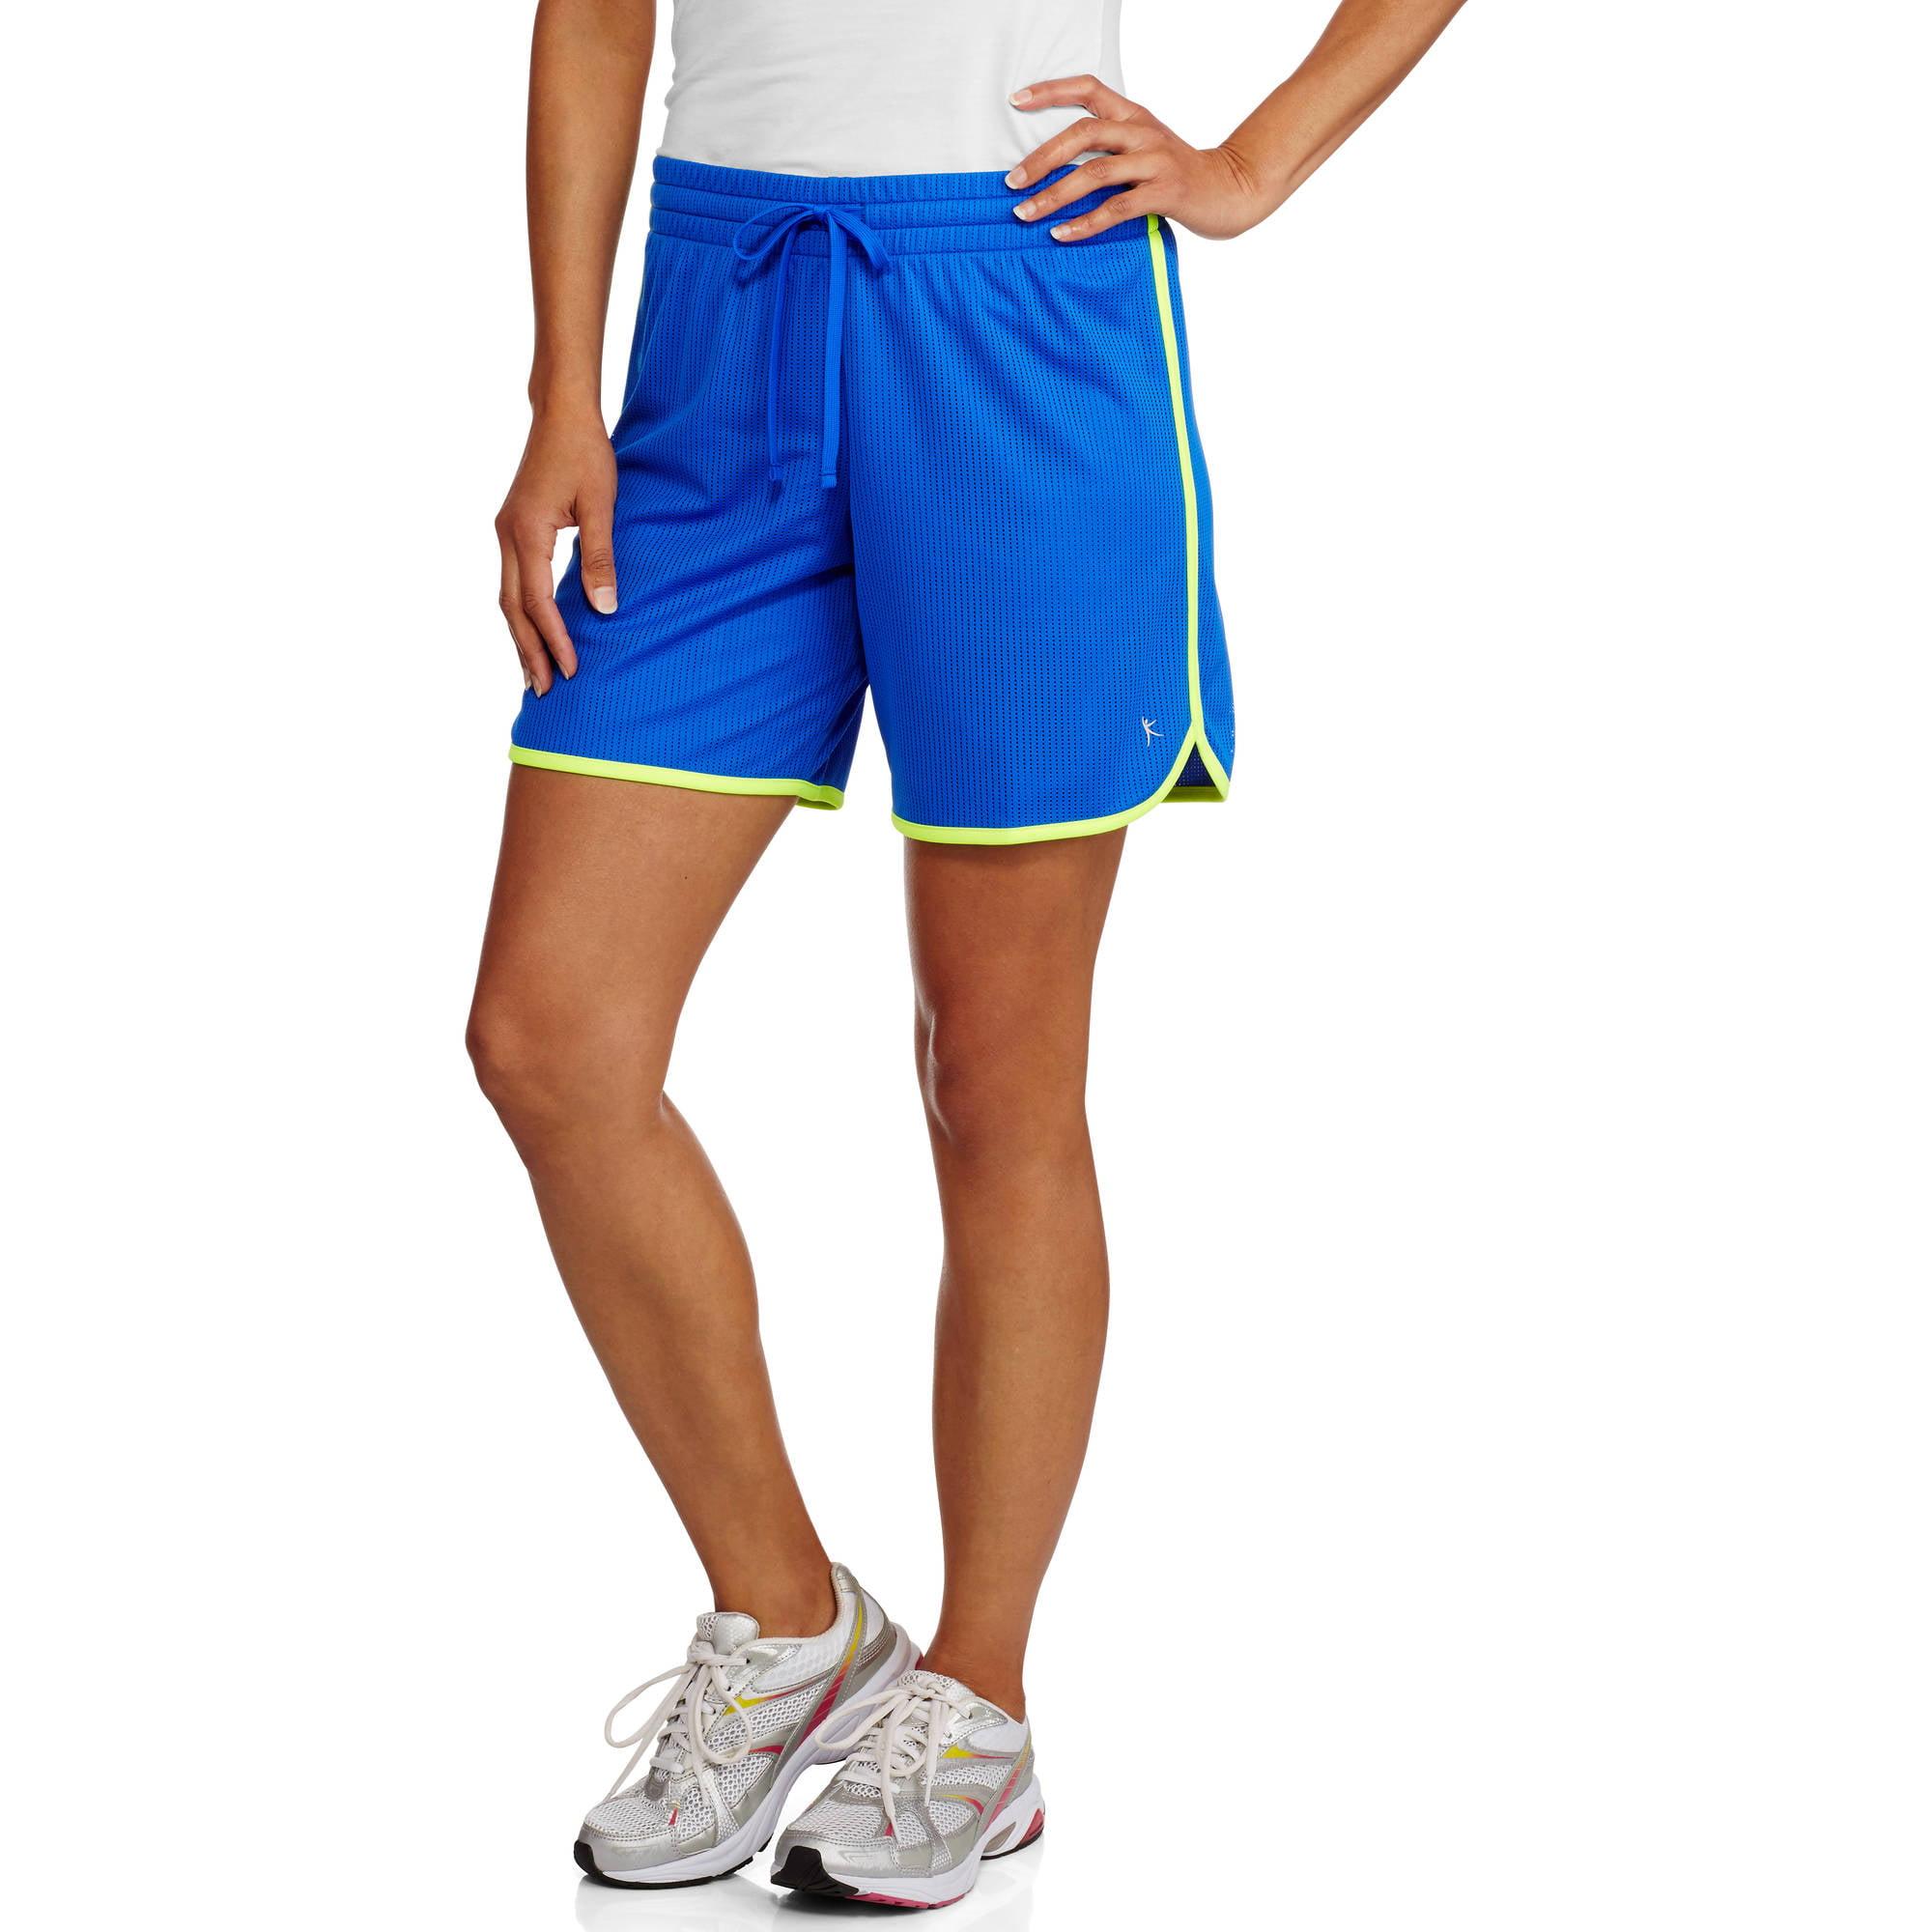 Danskin Now Women's Active Long Mesh Basketball Shorts